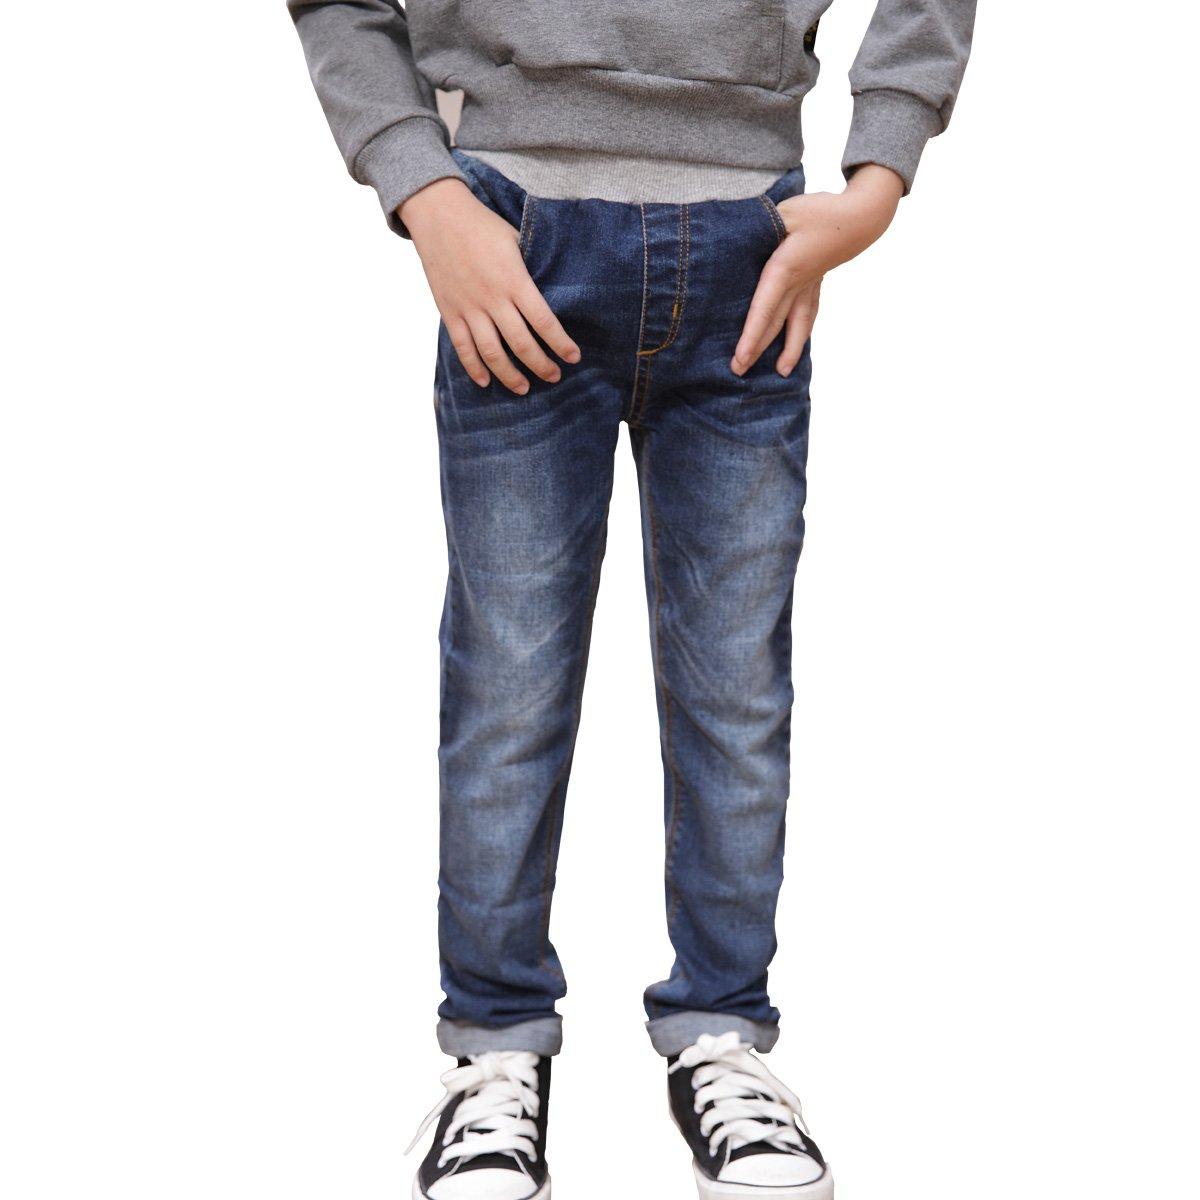 NABER Kids Boys Casual Elastic Waist Denim Pants Blue Washed Jeans Age 4-13 Yrs